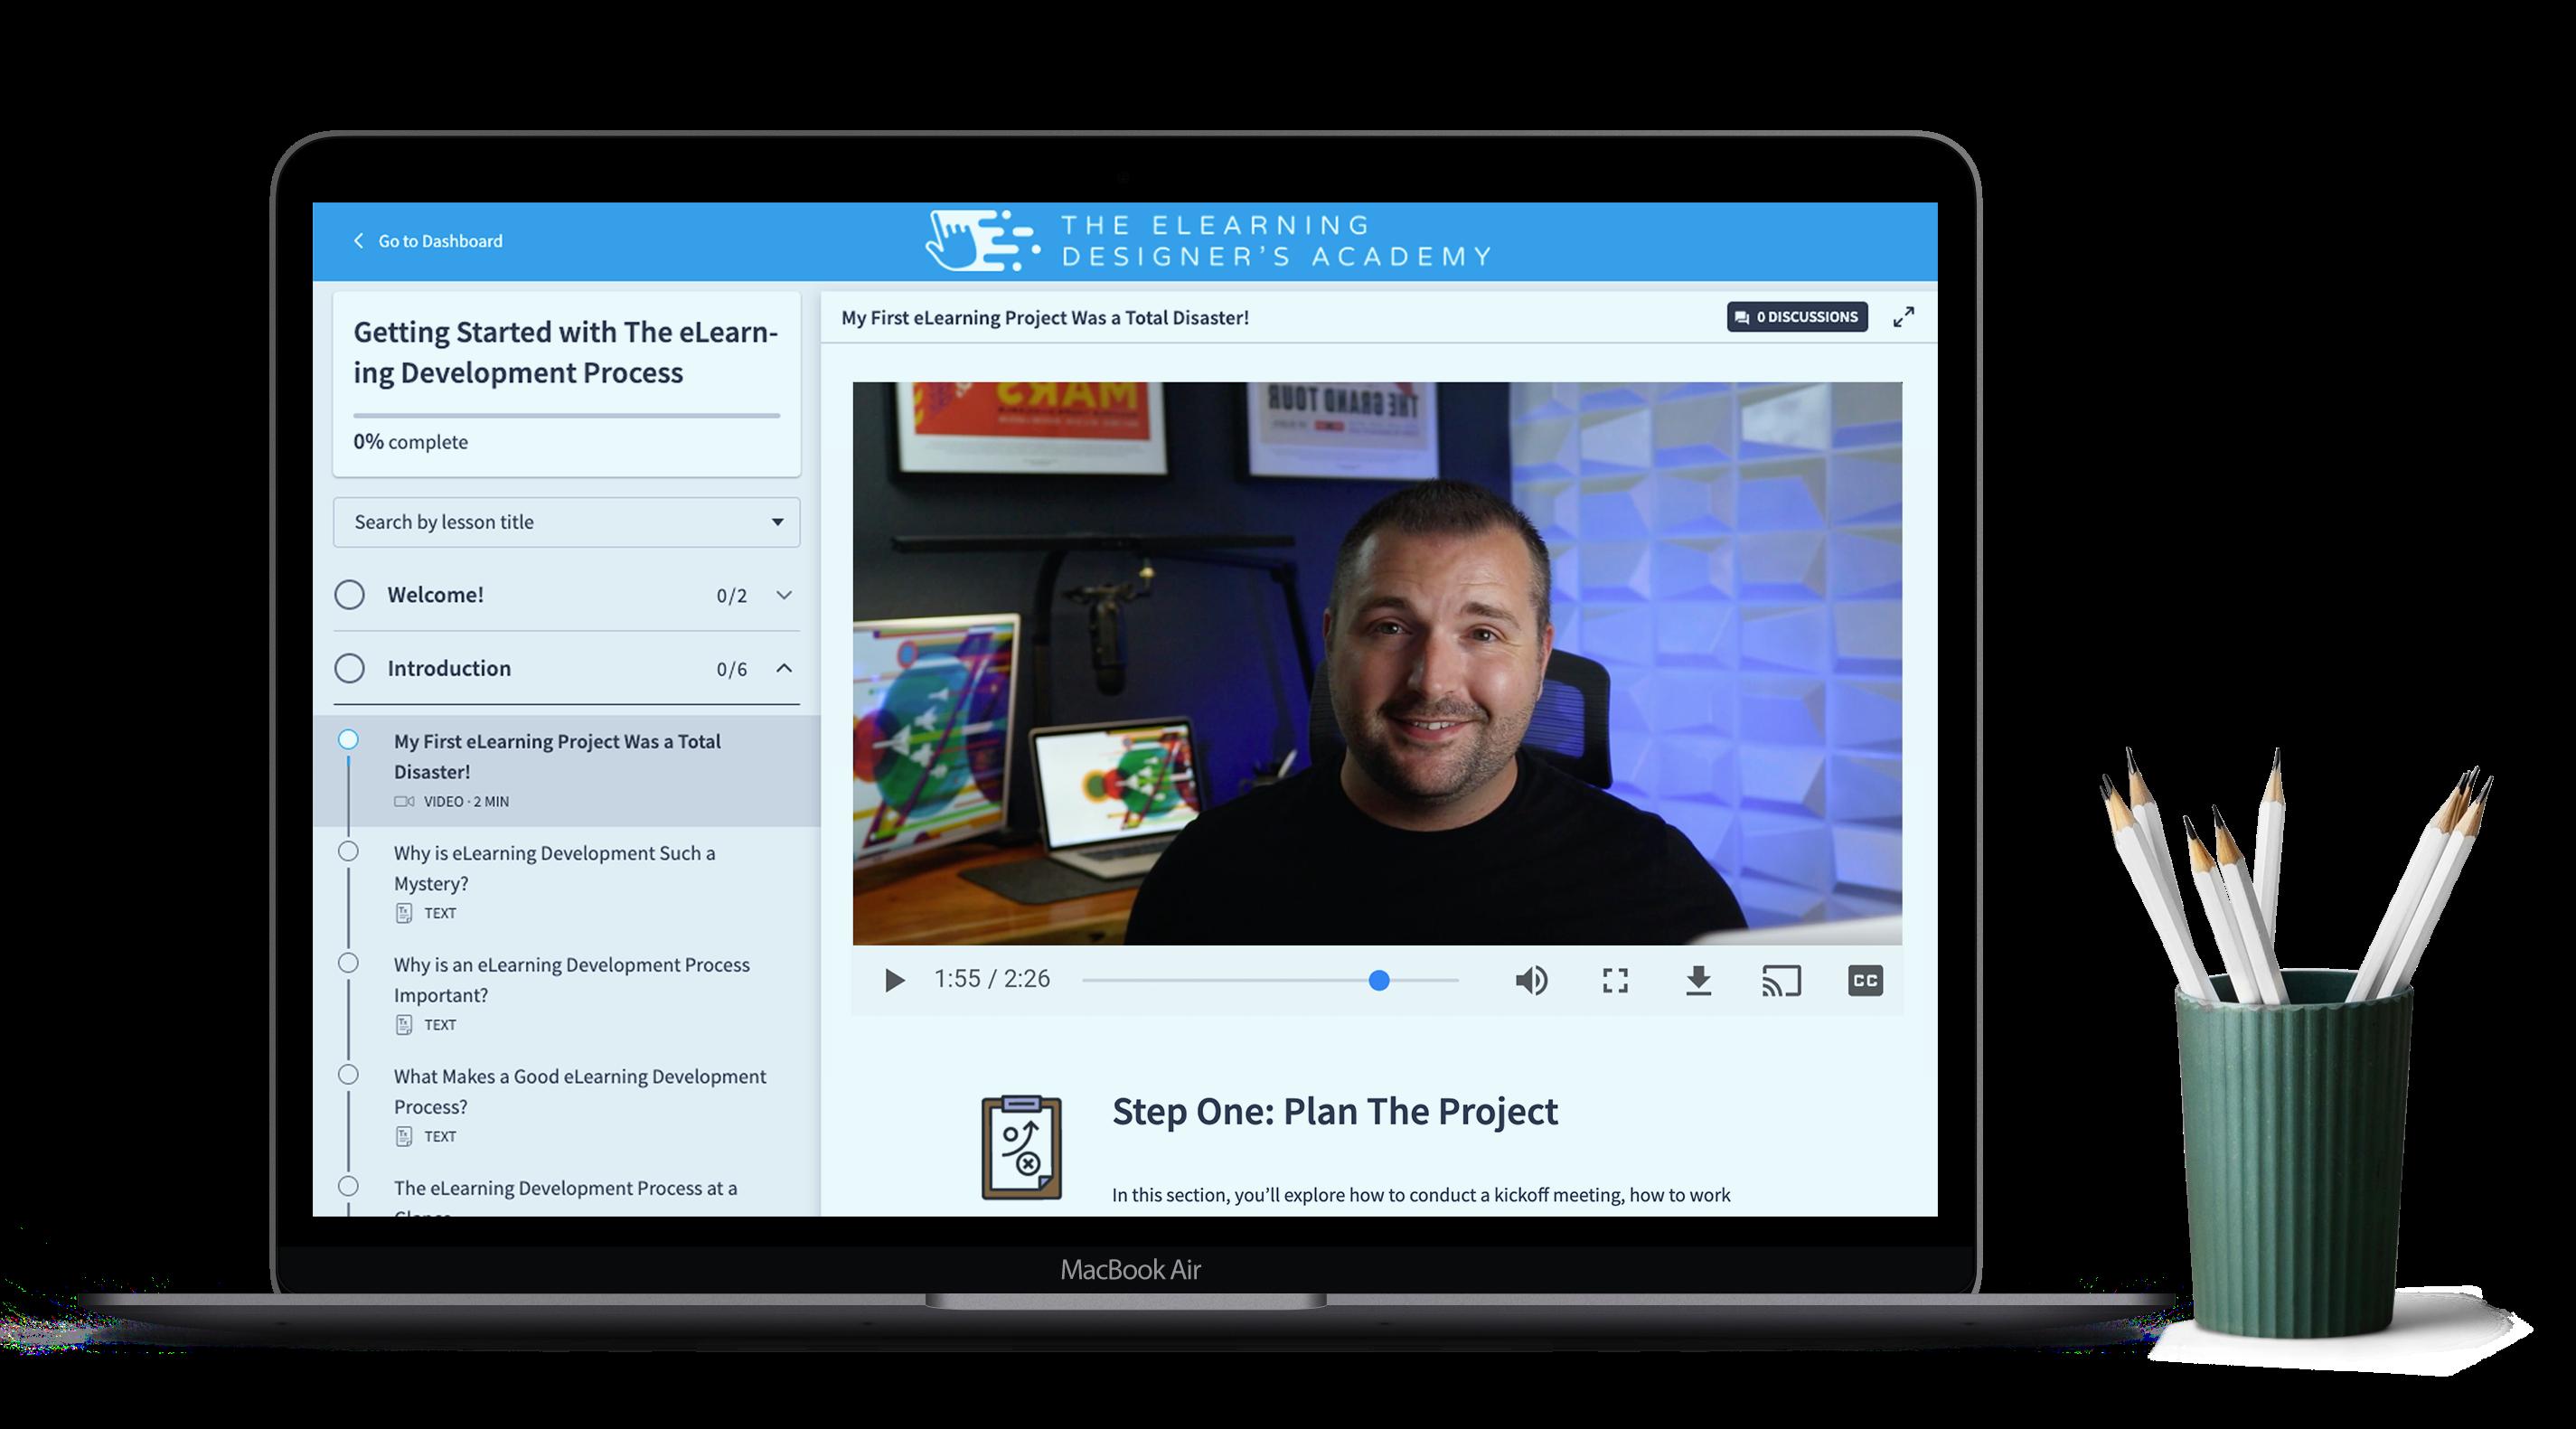 eLearning workshops and training by Tim Slade | Freelance eLearning Designer and developer | The eLearning Designer's Academy